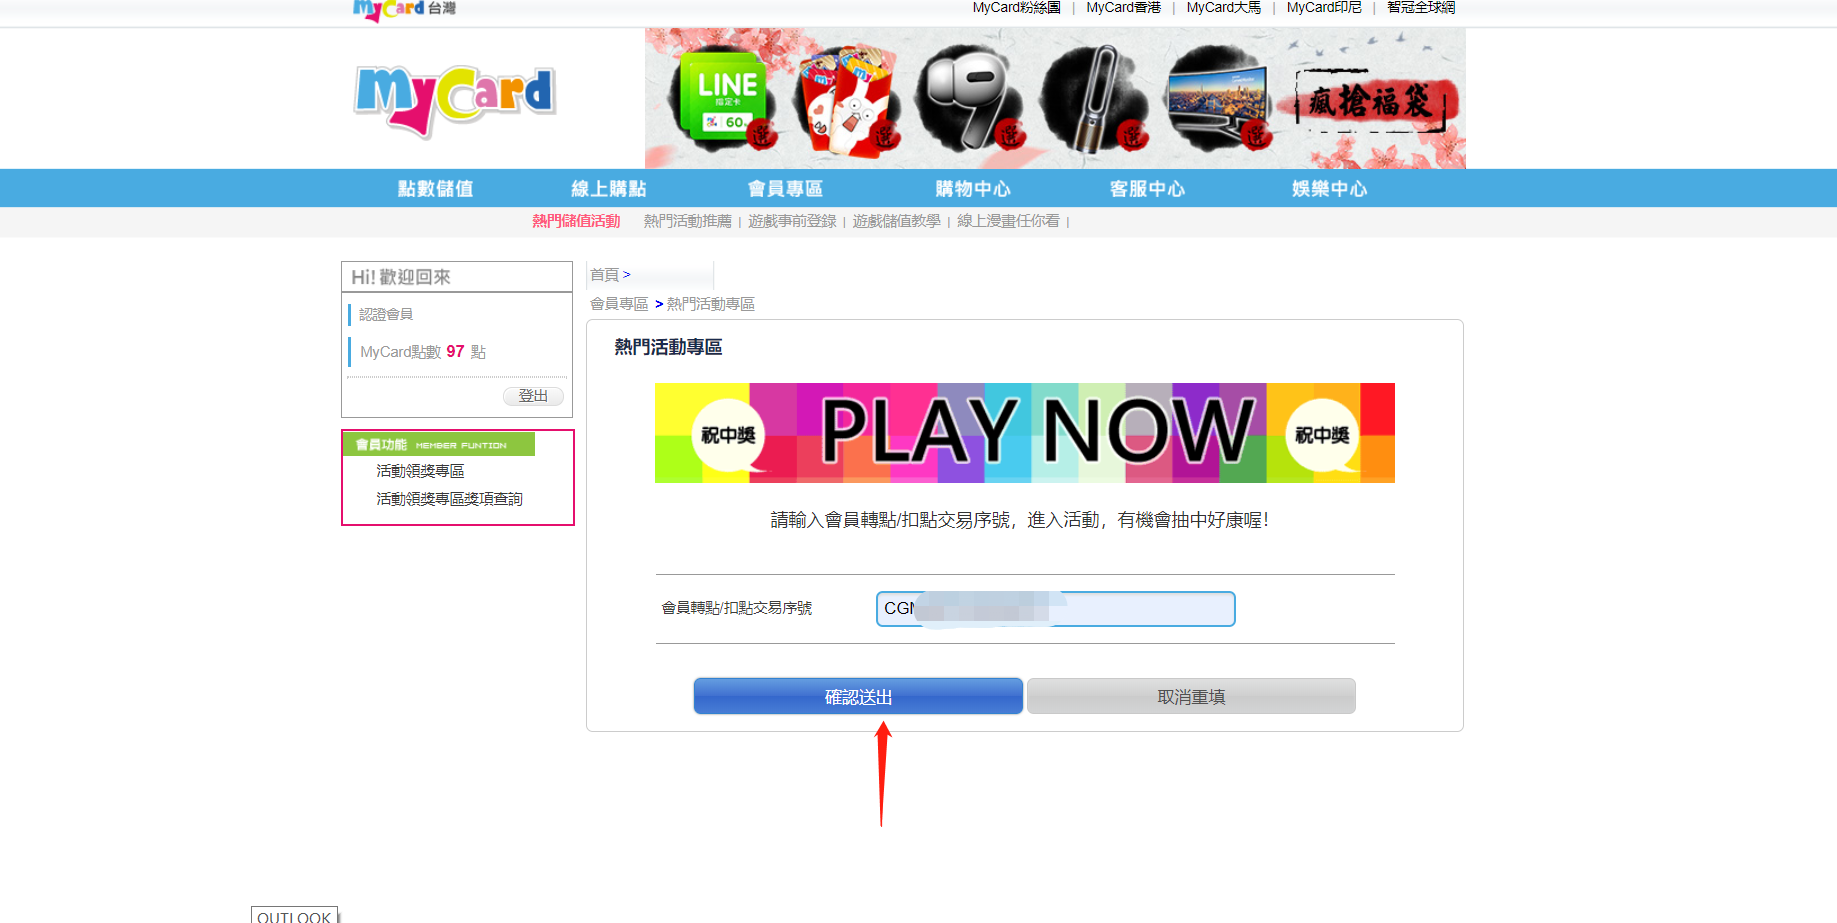 Mycard儲值活動詳細流程指南-确认退出.png